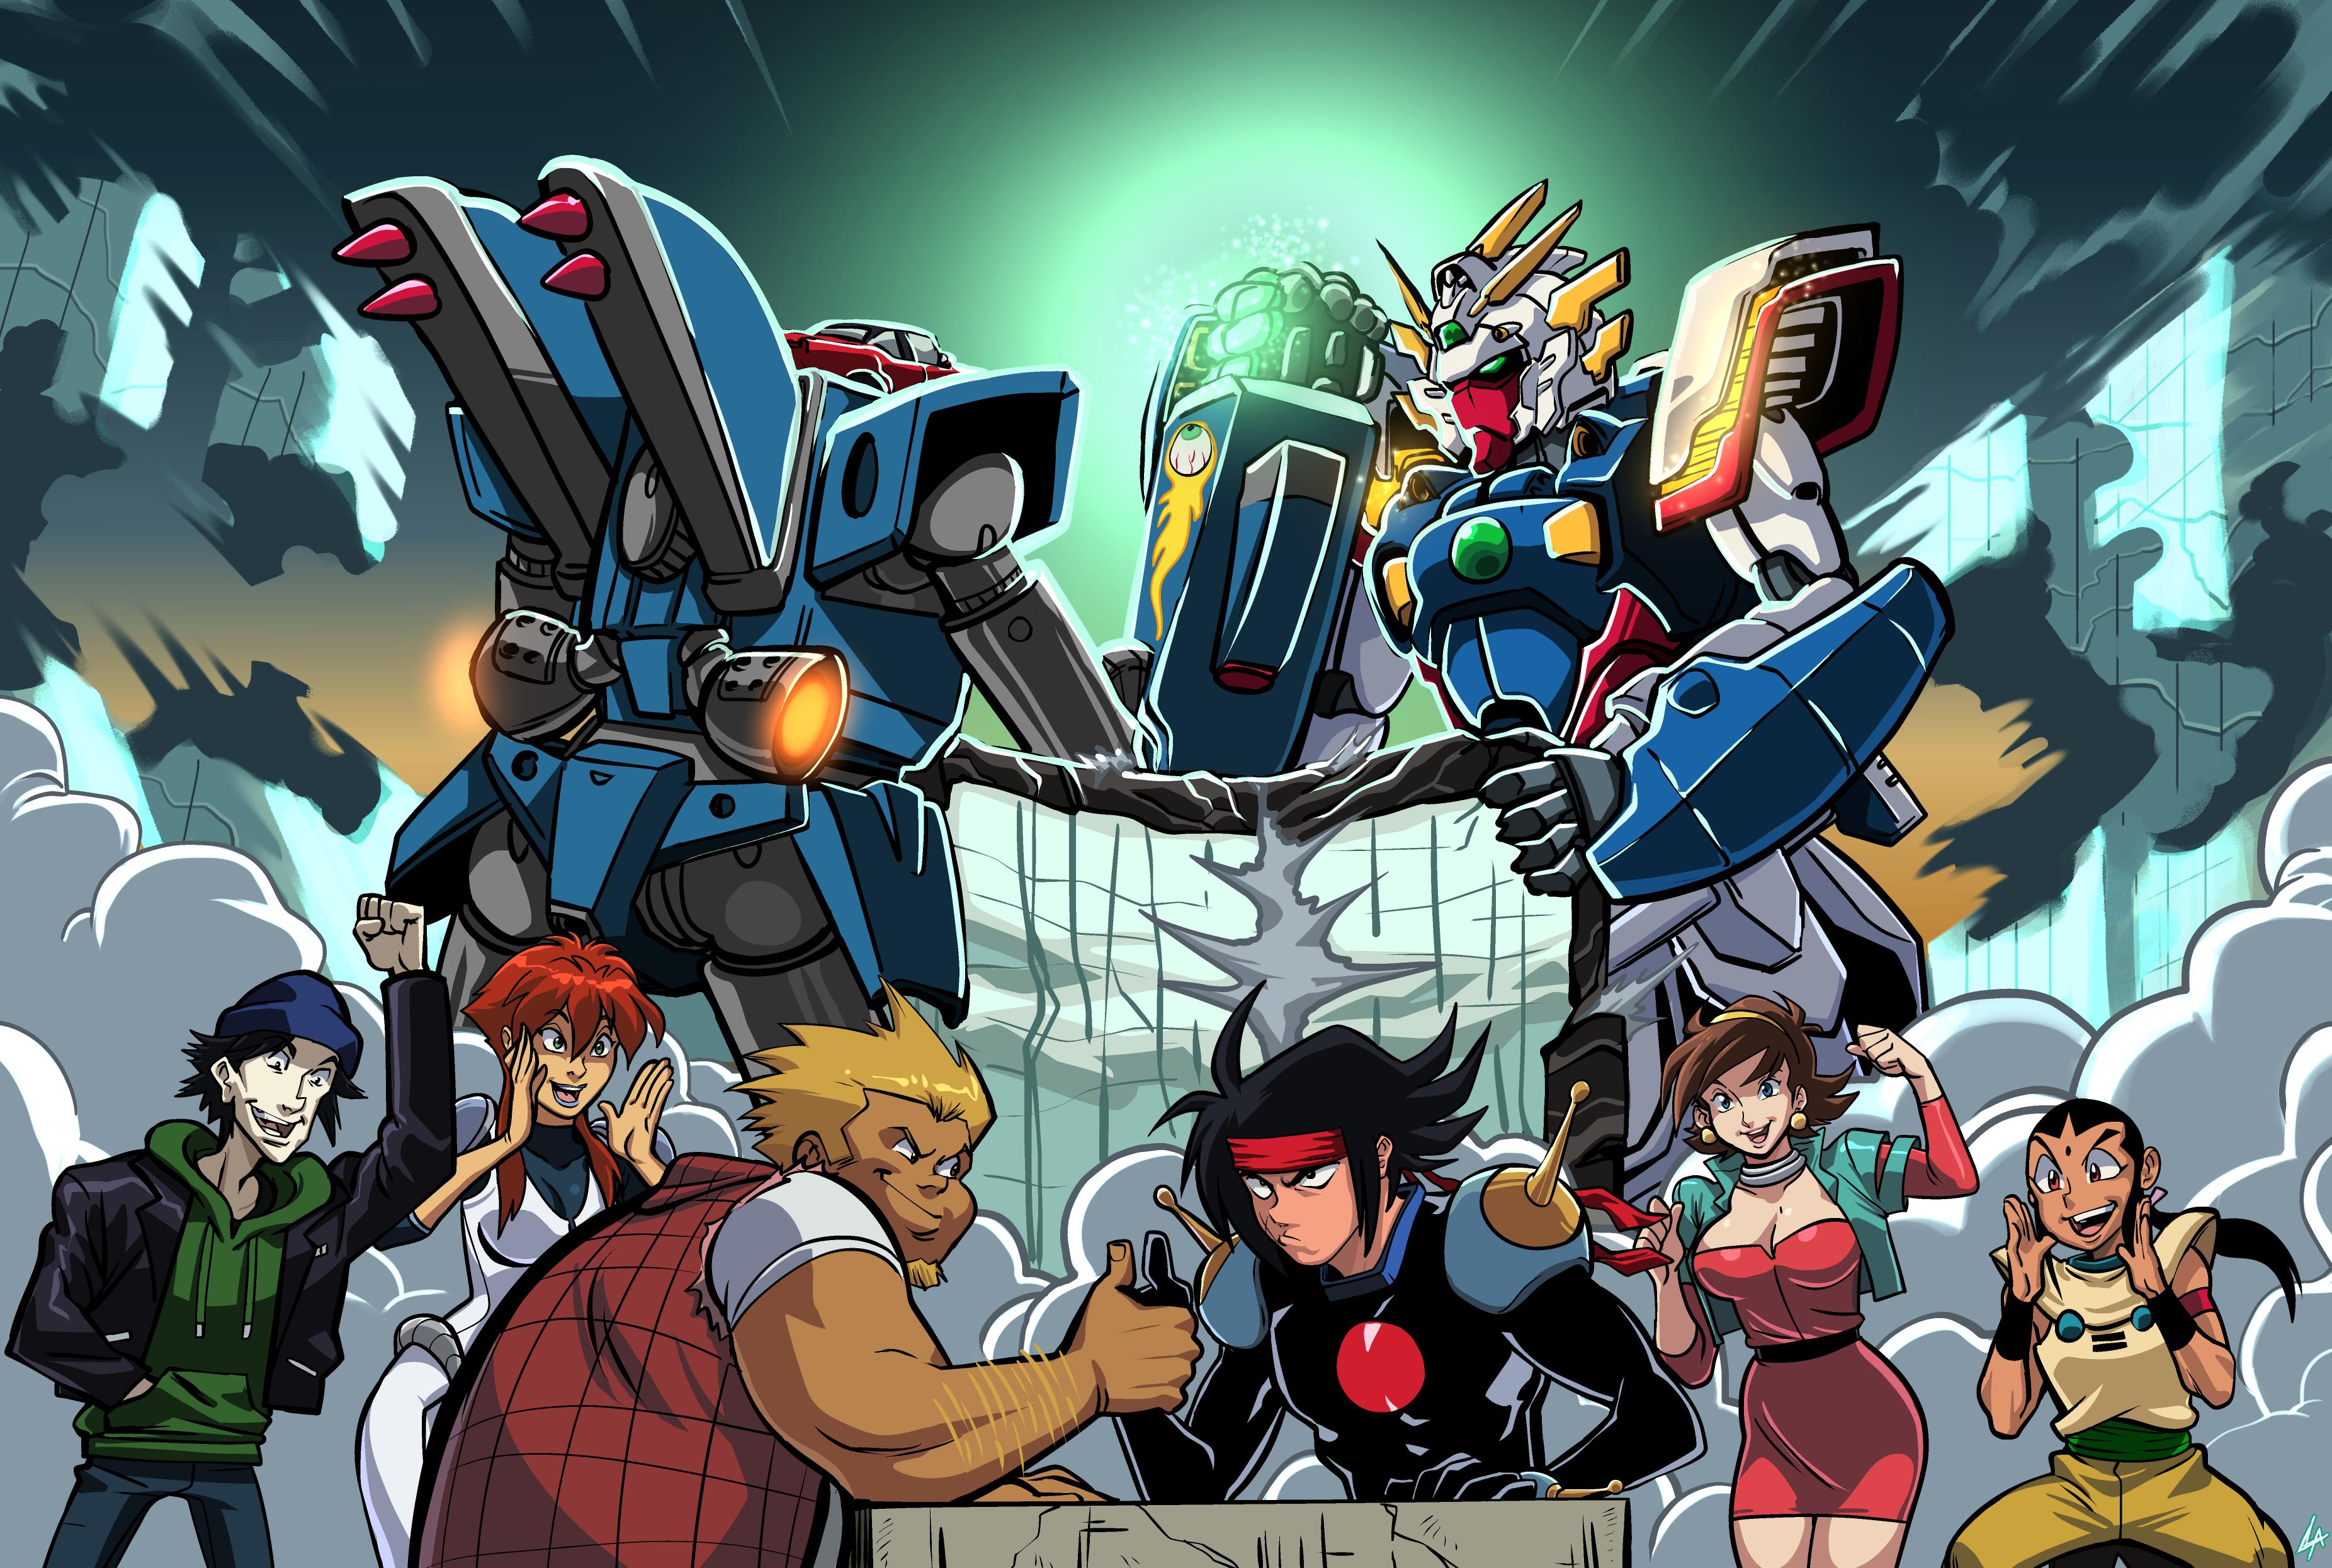 Megas XLR vs G Gundam   Crossovers   Anime art, Art inspo, Art